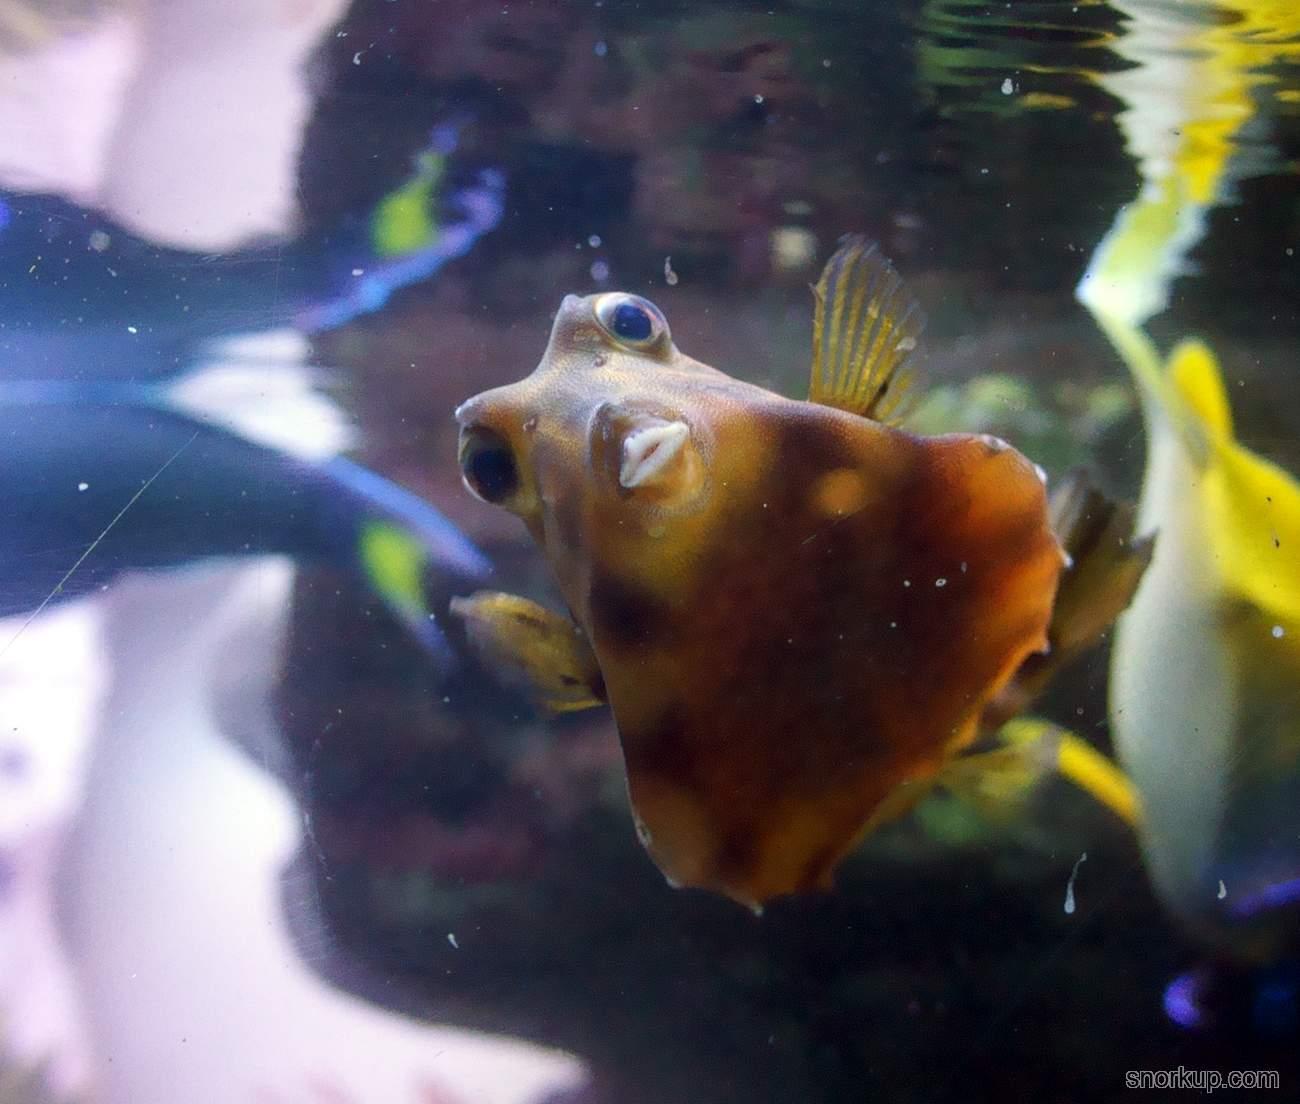 Горбатый кузовок - Tetrosomus gibbosus - Humpback turretfish, Thornback turretfish